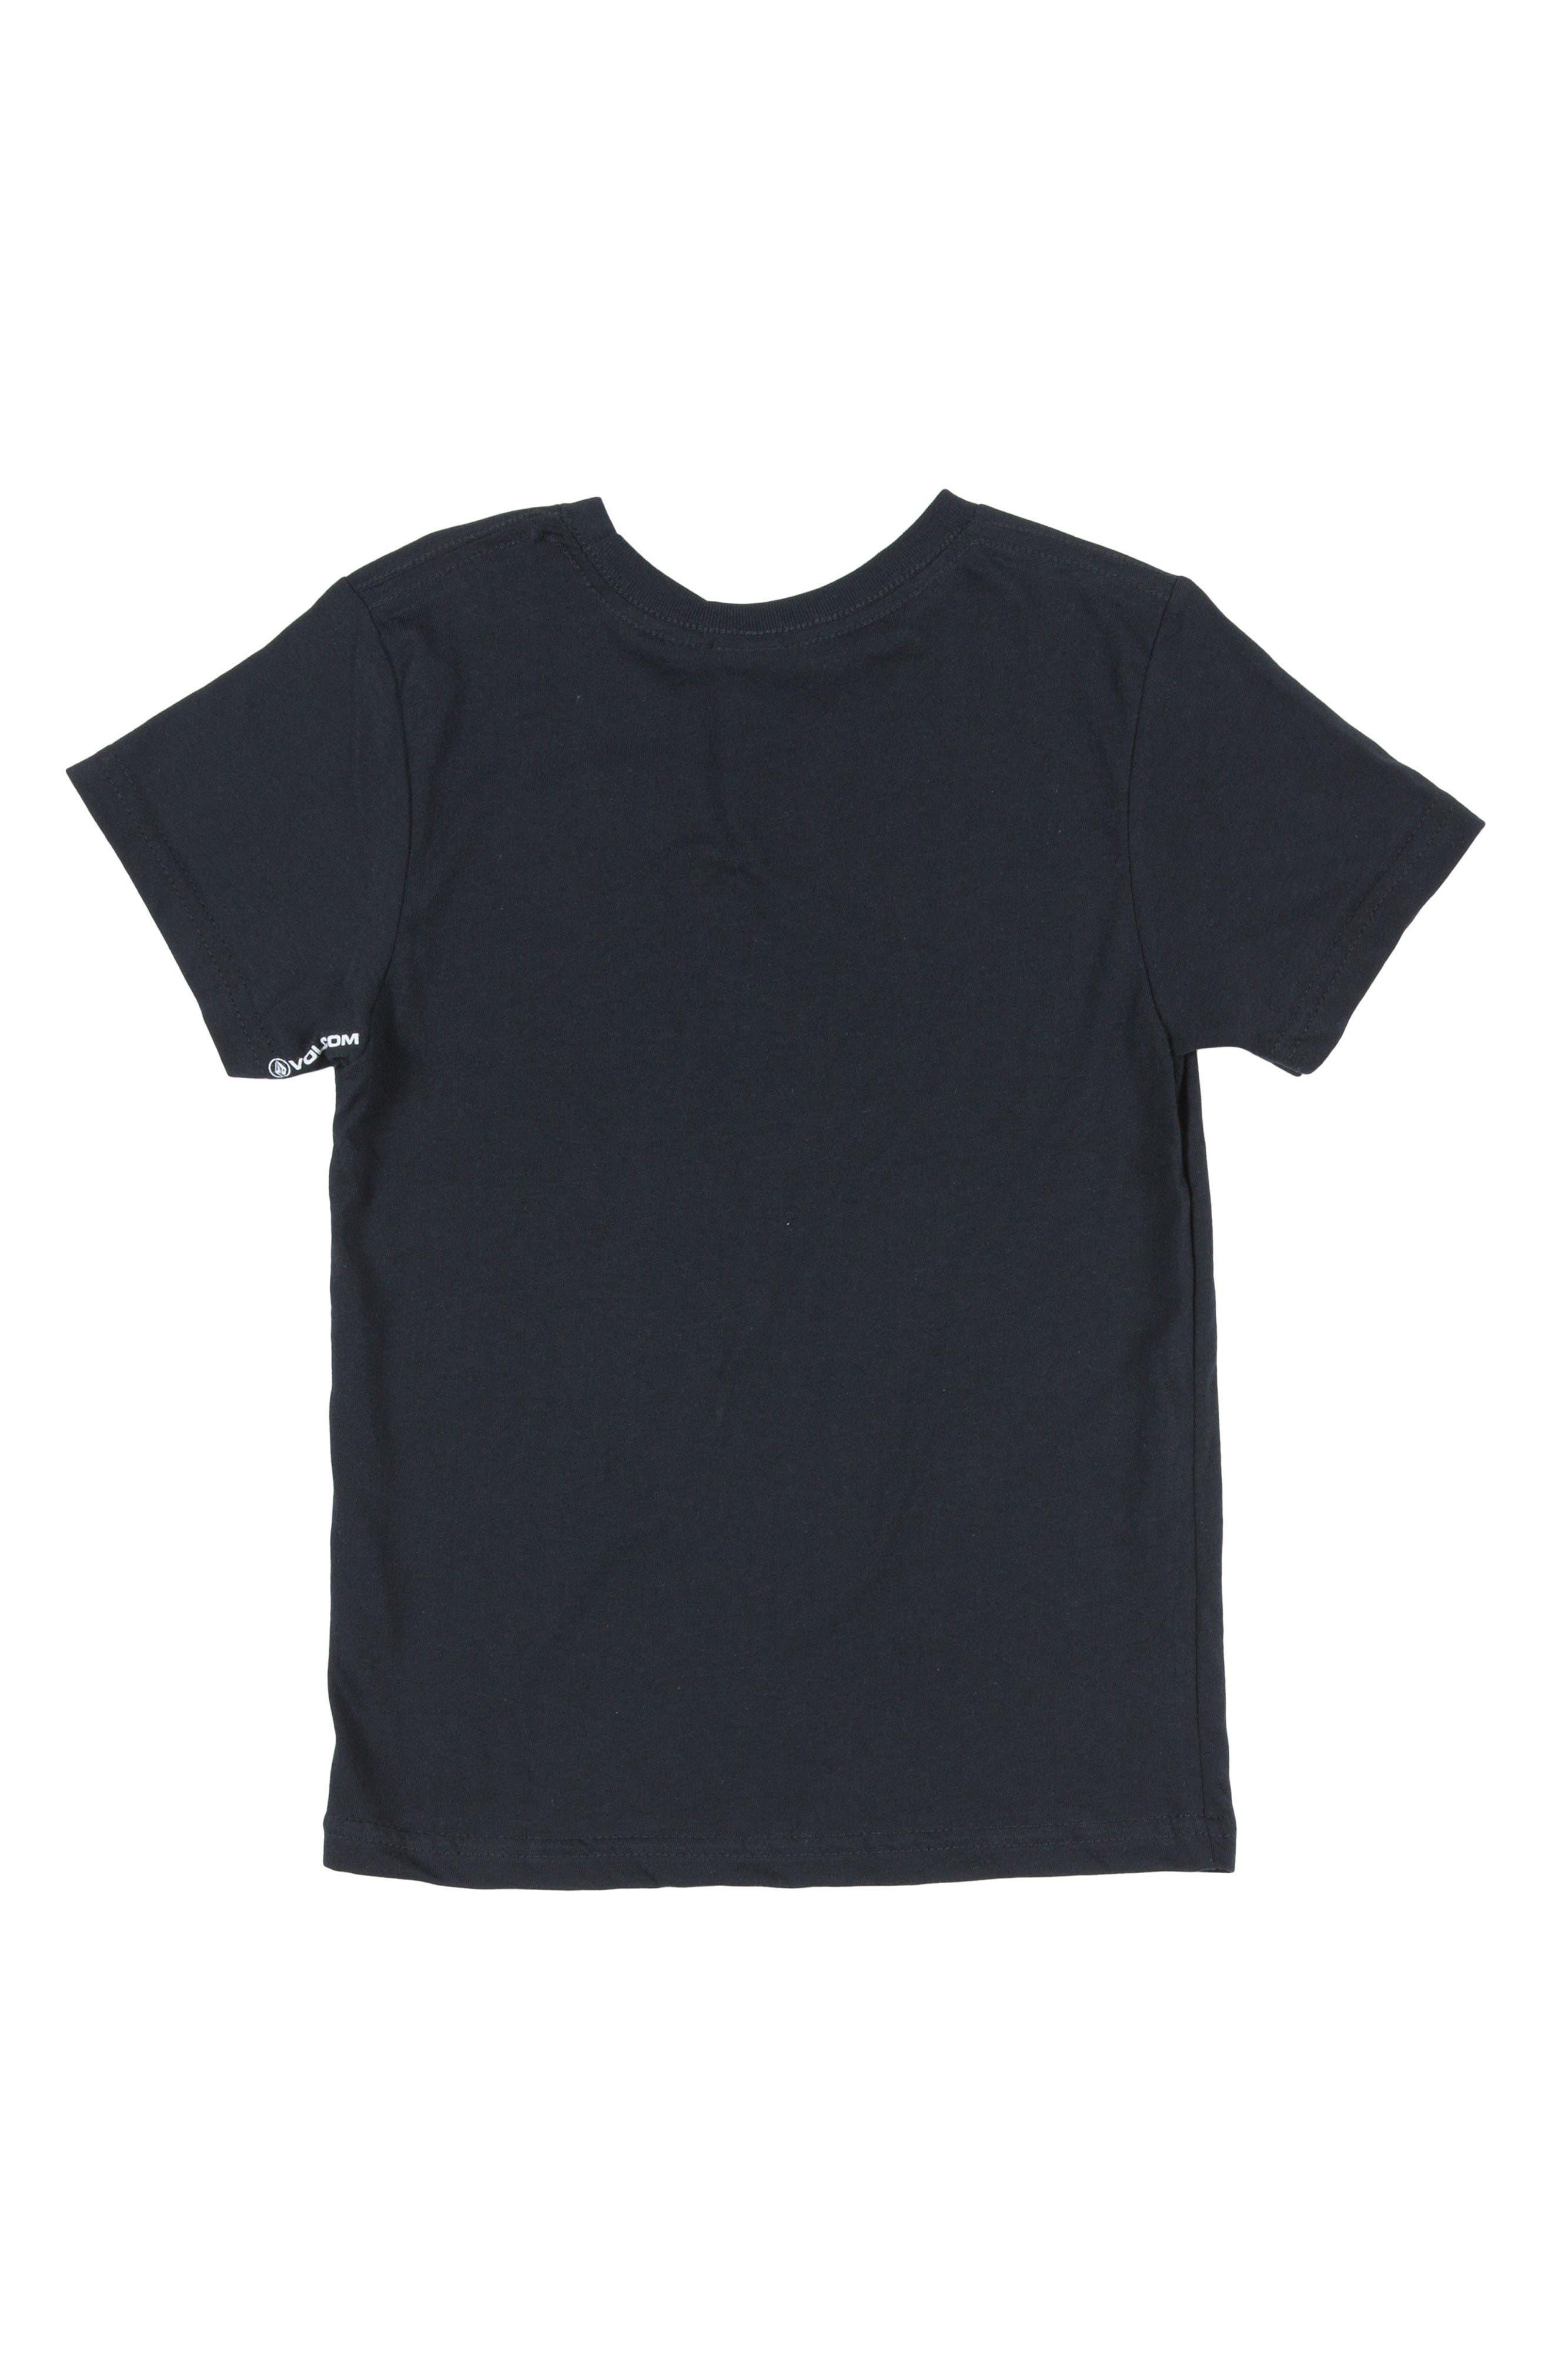 Alternate Image 2  - Volcom Lino Euro Graphic T-Shirt (Big Boys)